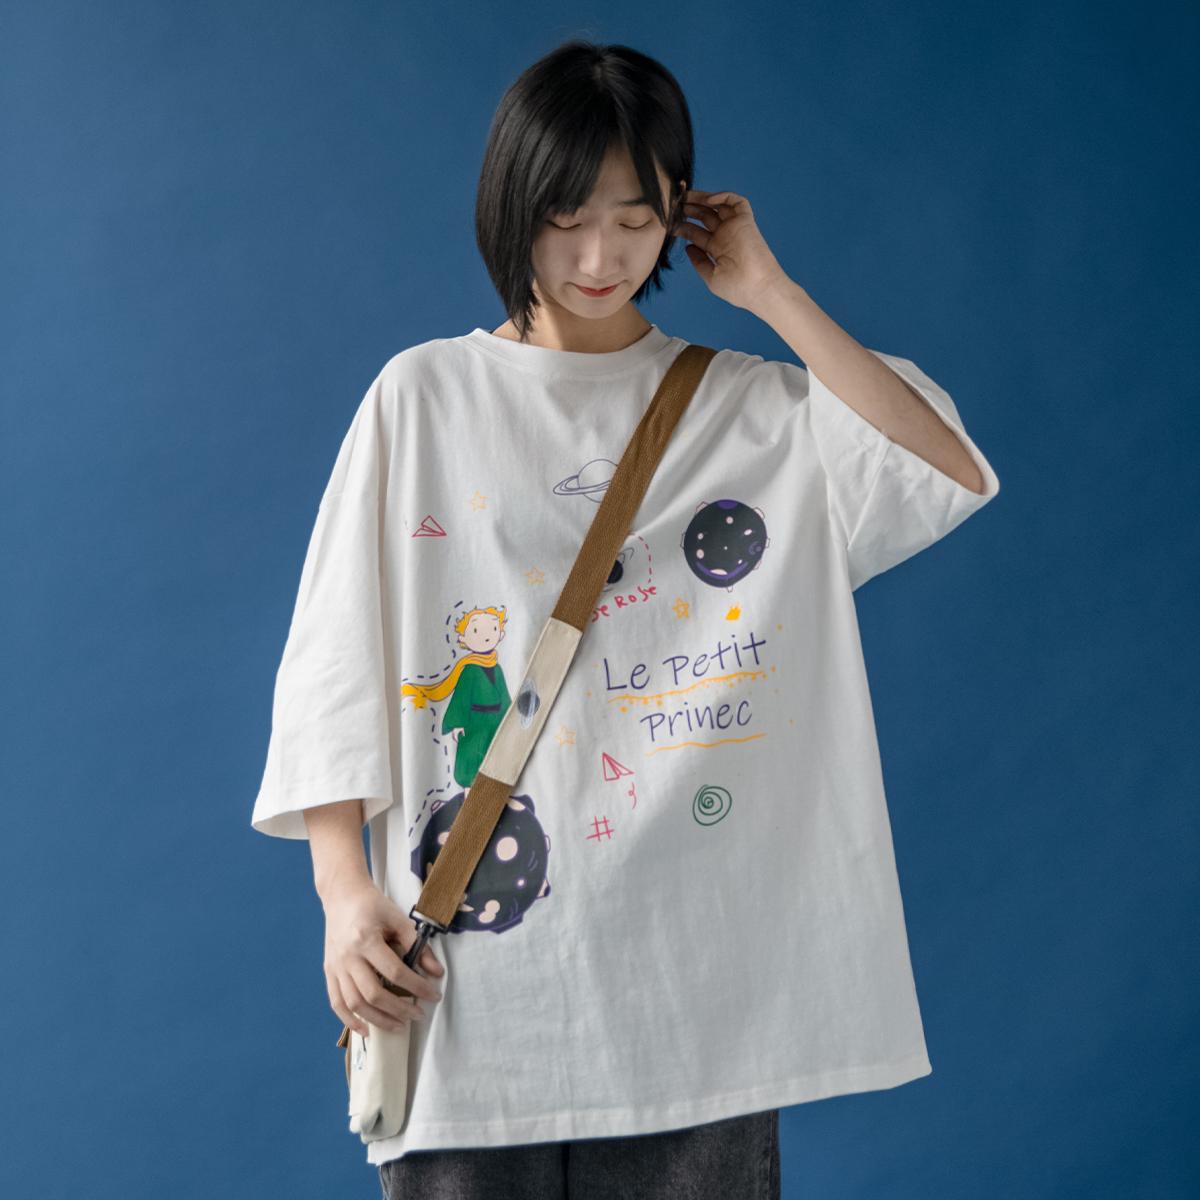 AzLan短袖t恤女2020夏季新款韩版宽松原宿风ins半袖白色学生上衣图片